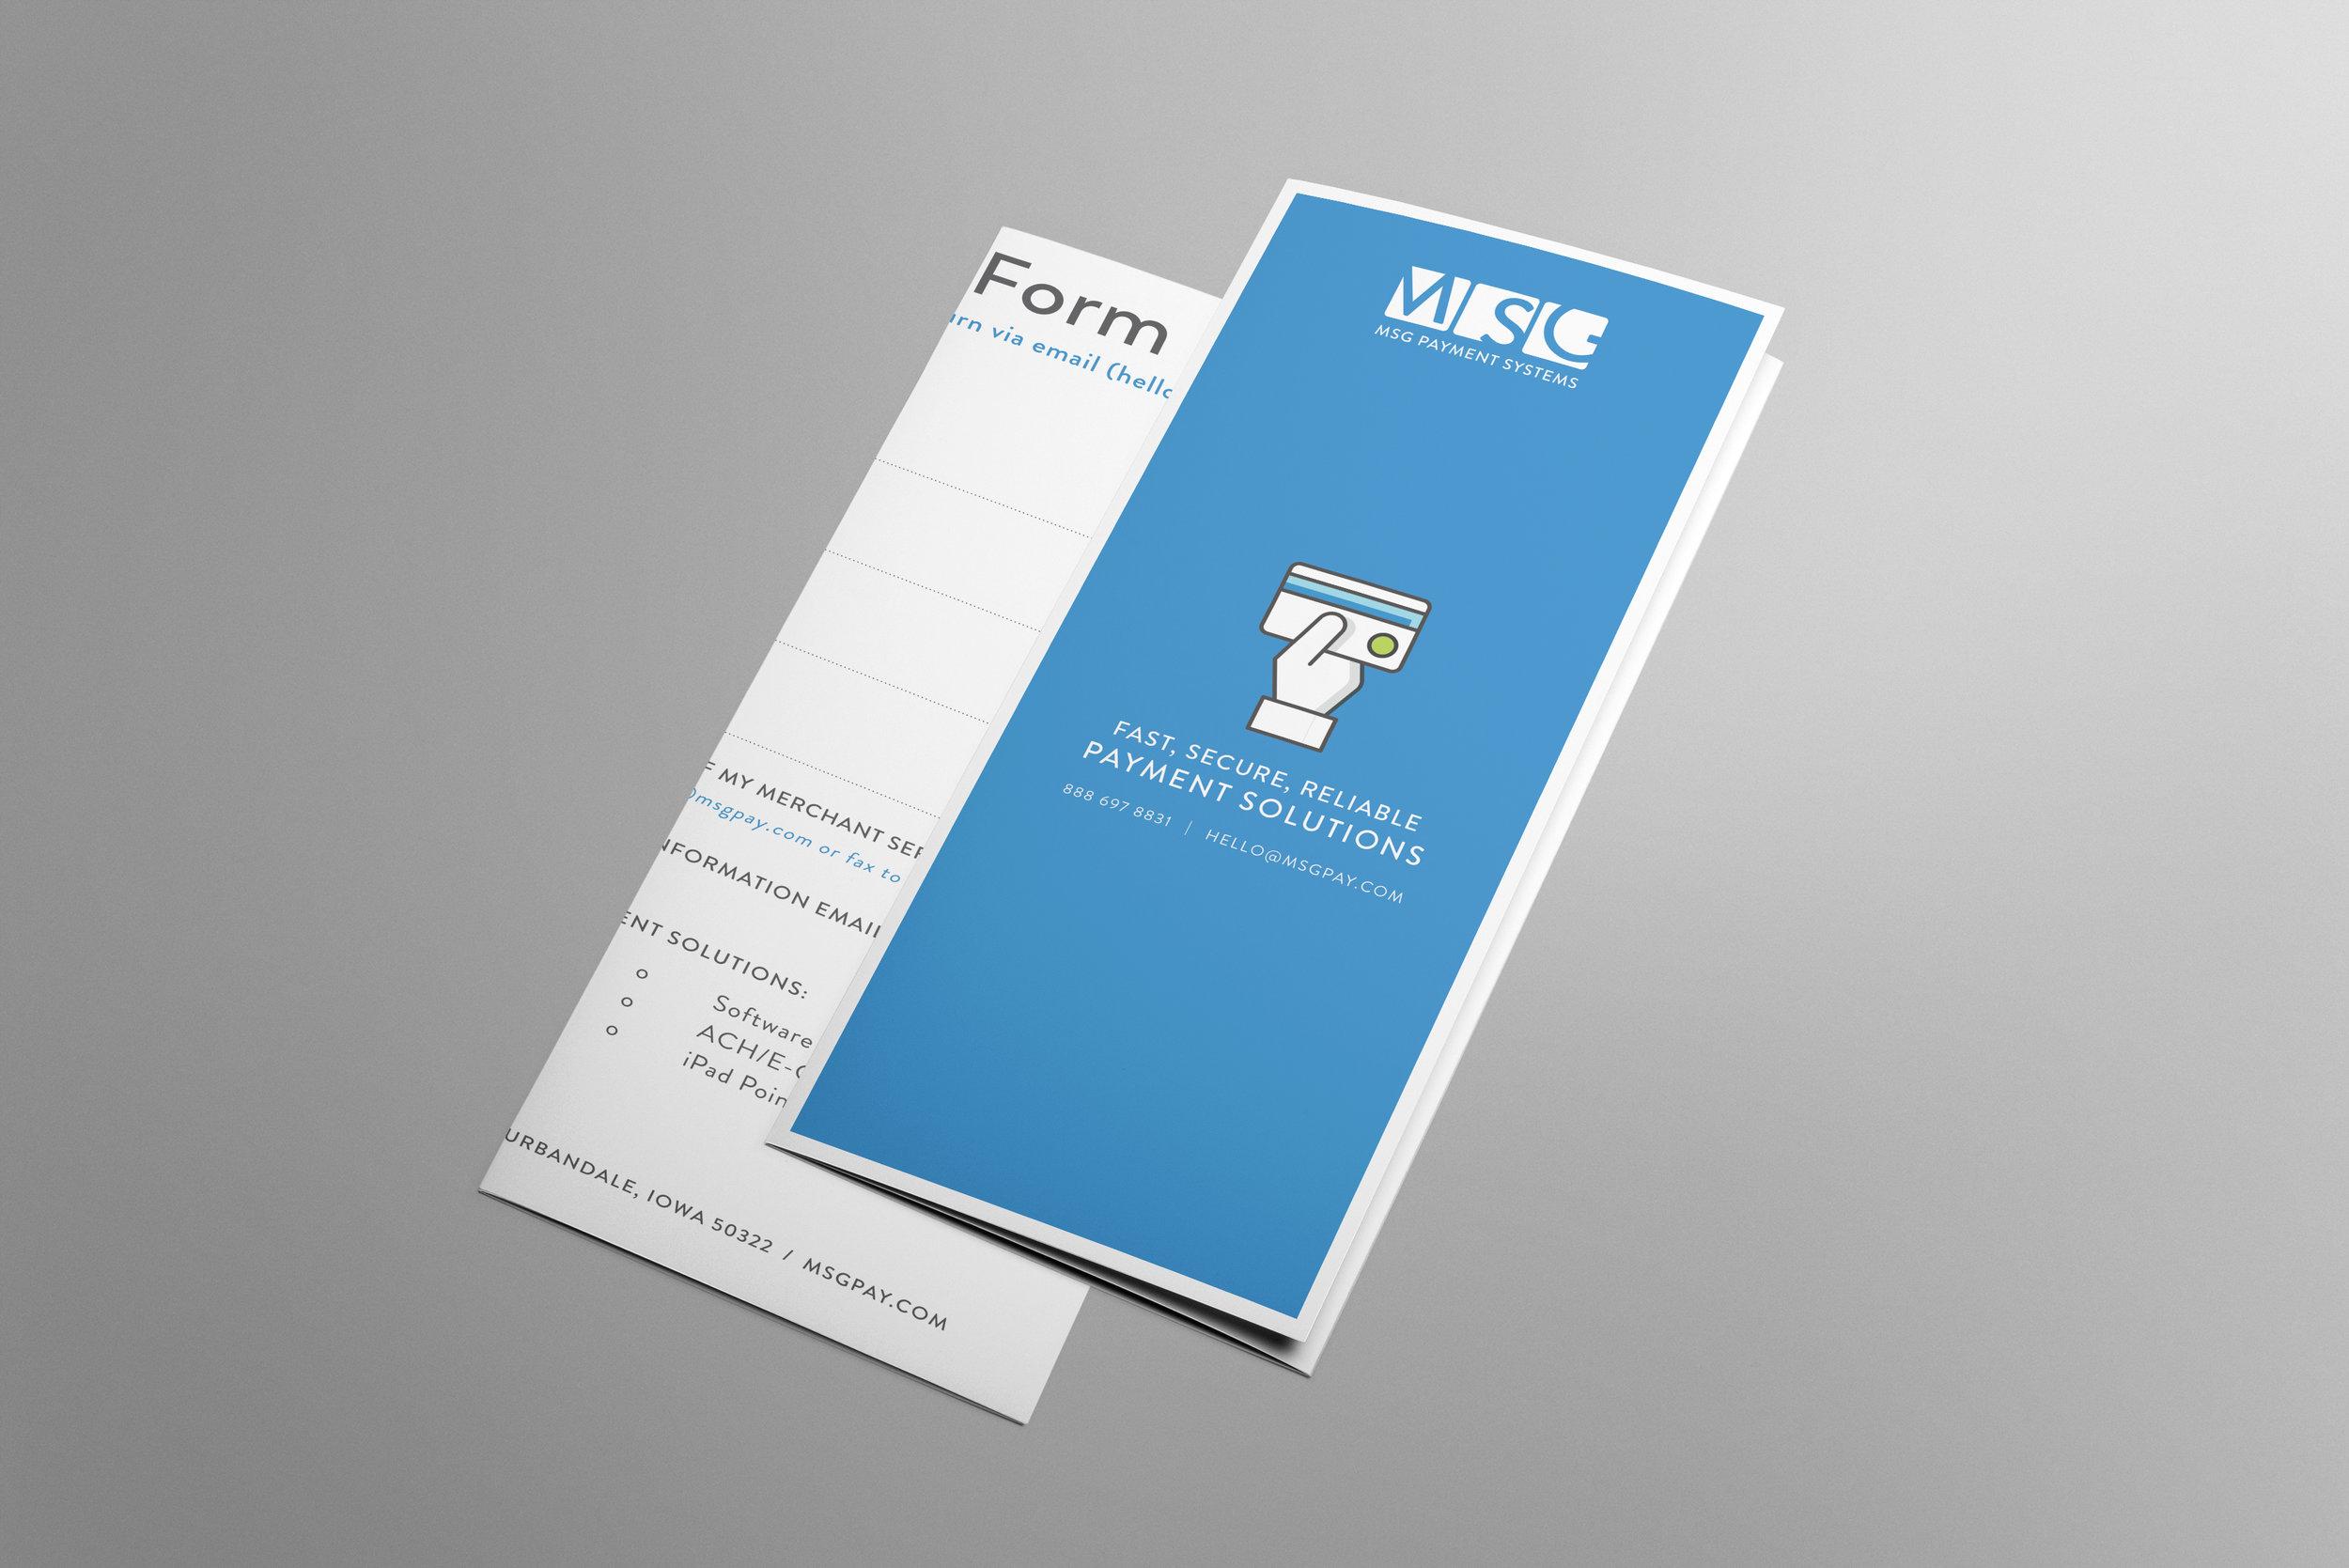 01-tri-fold-brochure-letter-mockup.jpg